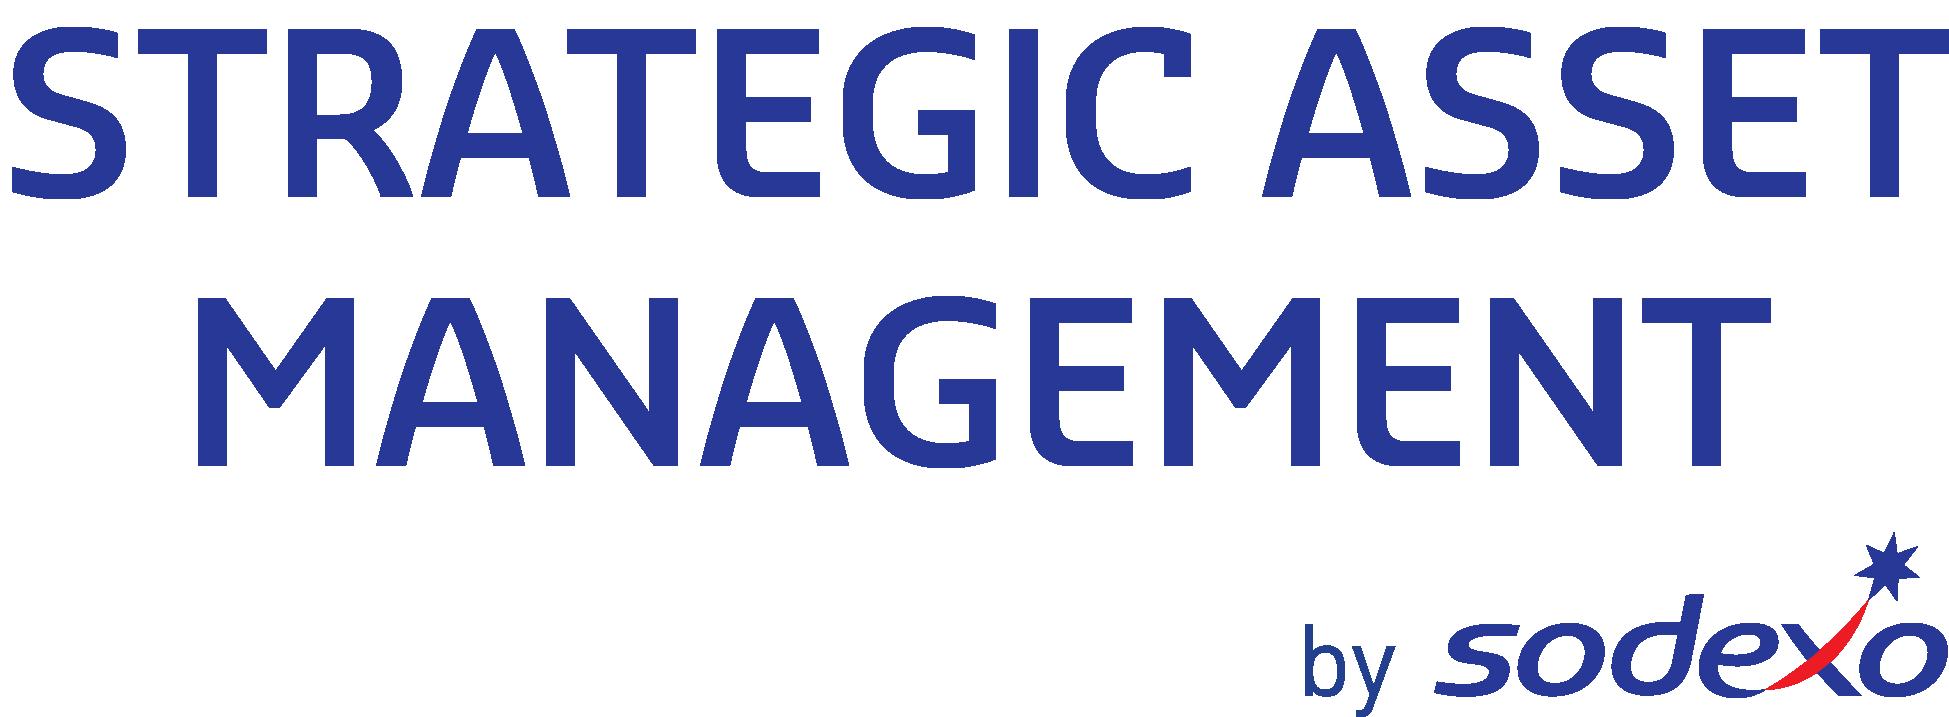 StrategicMgmt_C